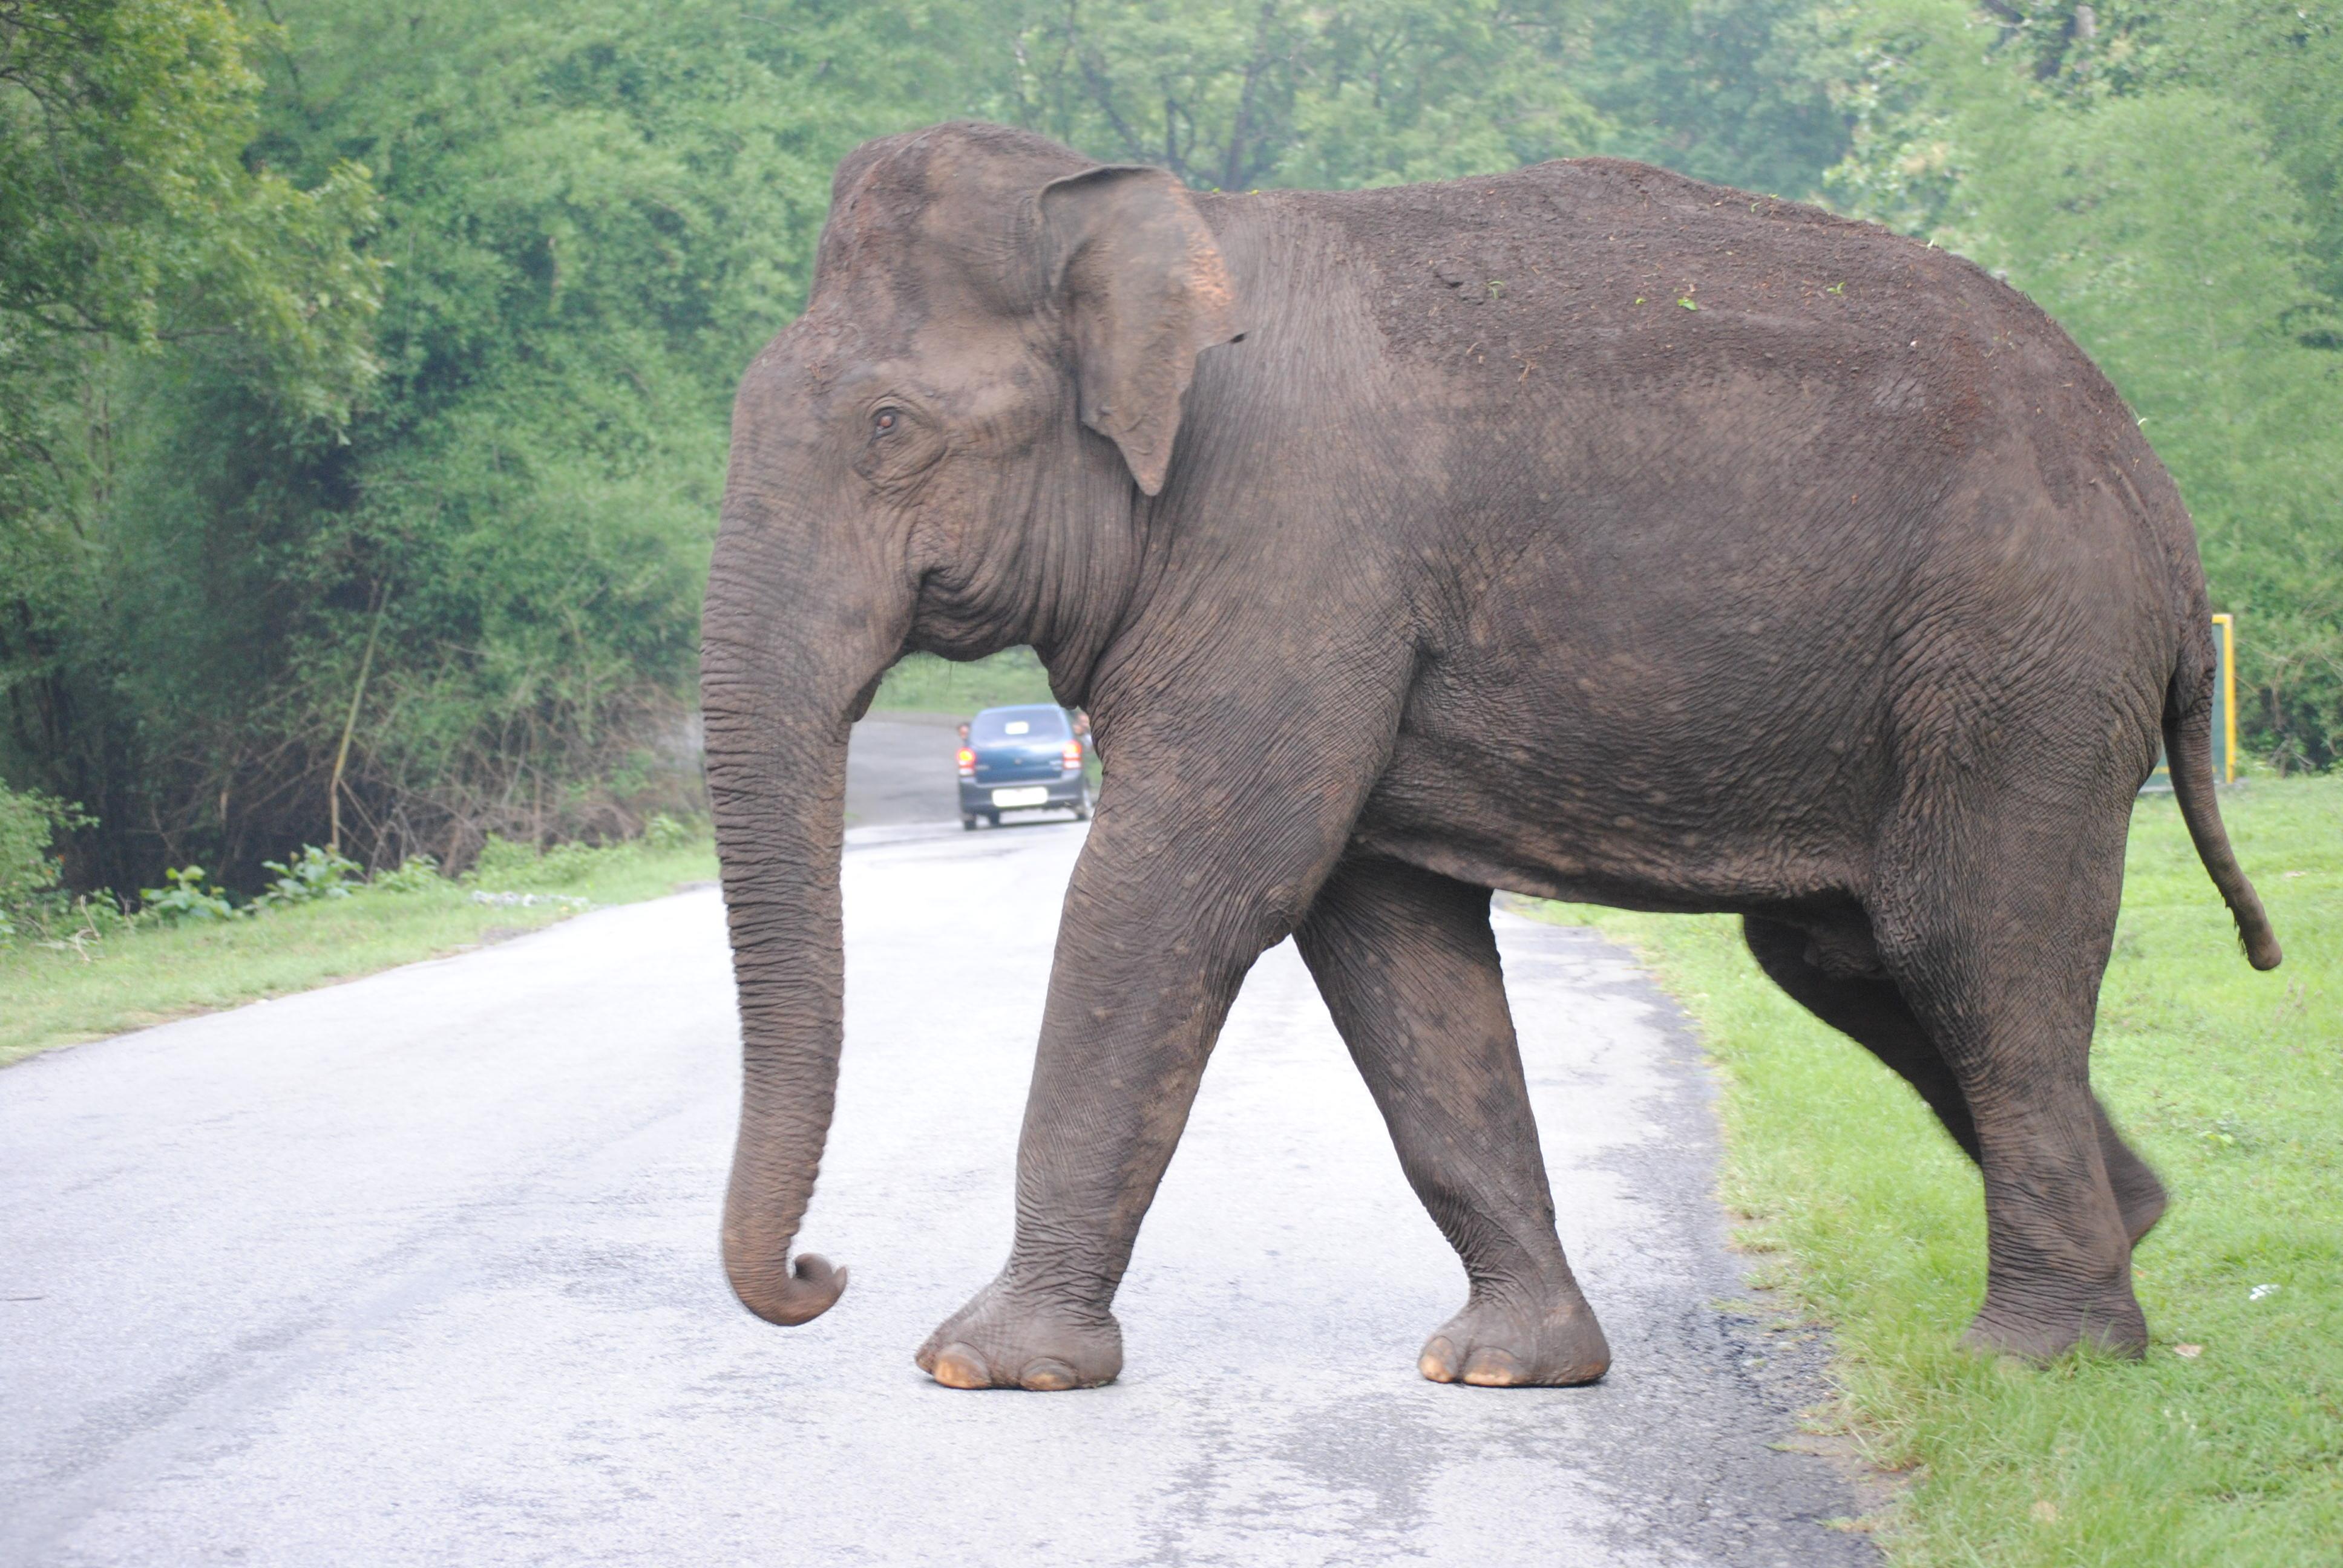 Single giant elephant walking on a road photo